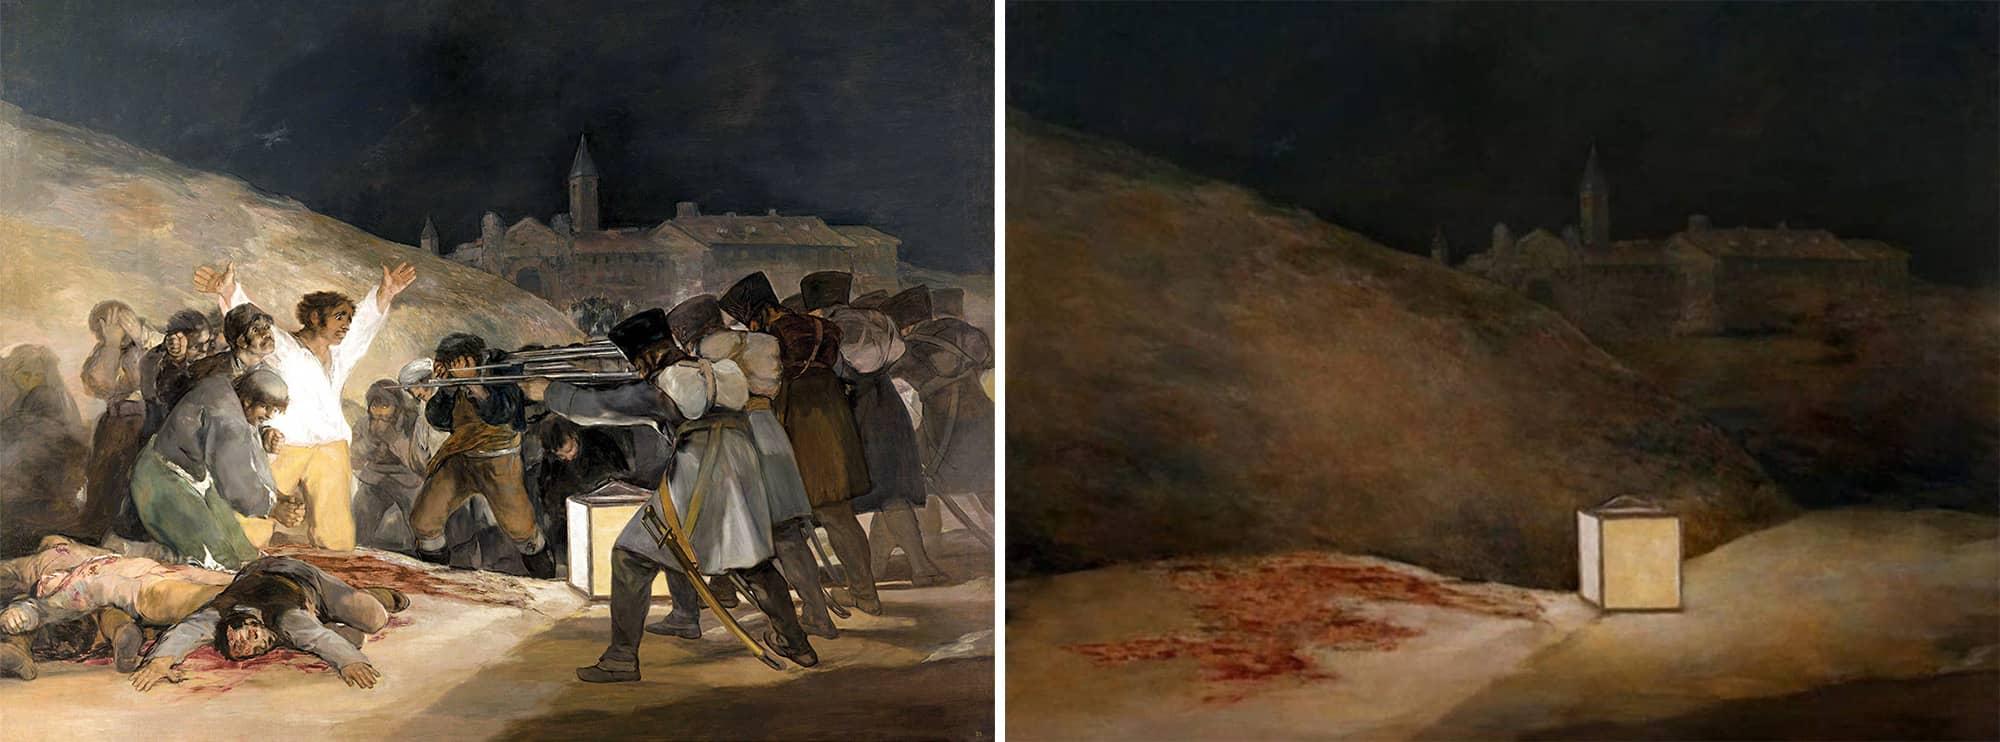 3 de Mayo de 1808 de Francisco de Goya